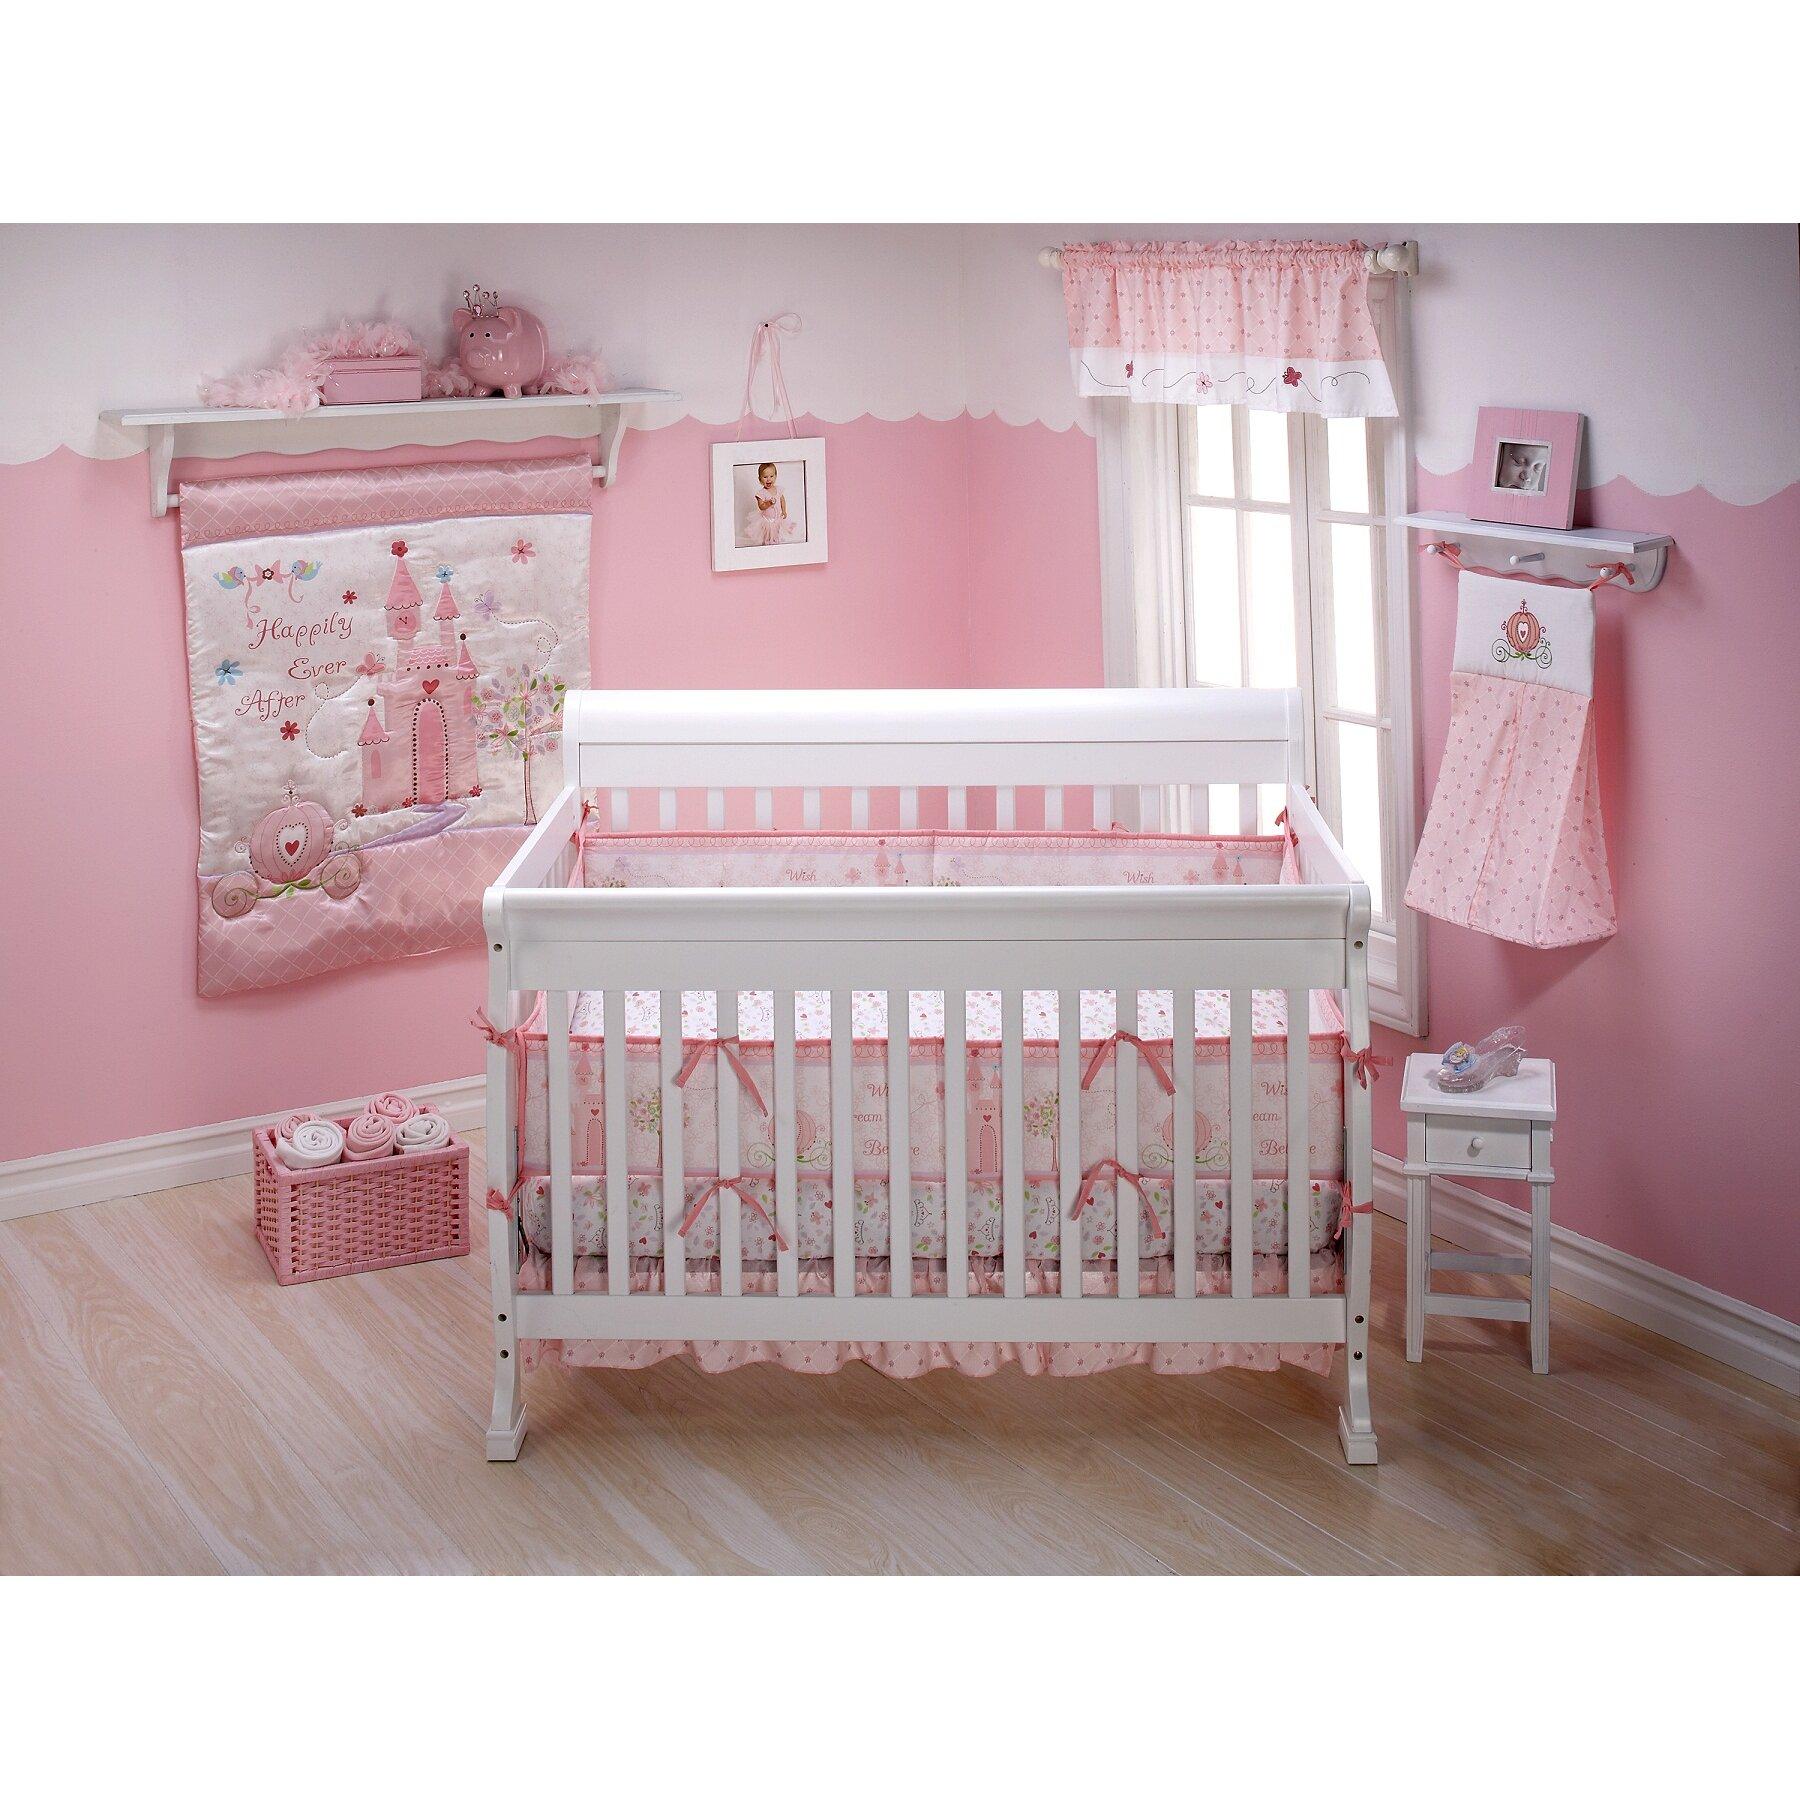 Disney Baby Princess Happily Ever After 3 Piece Crib